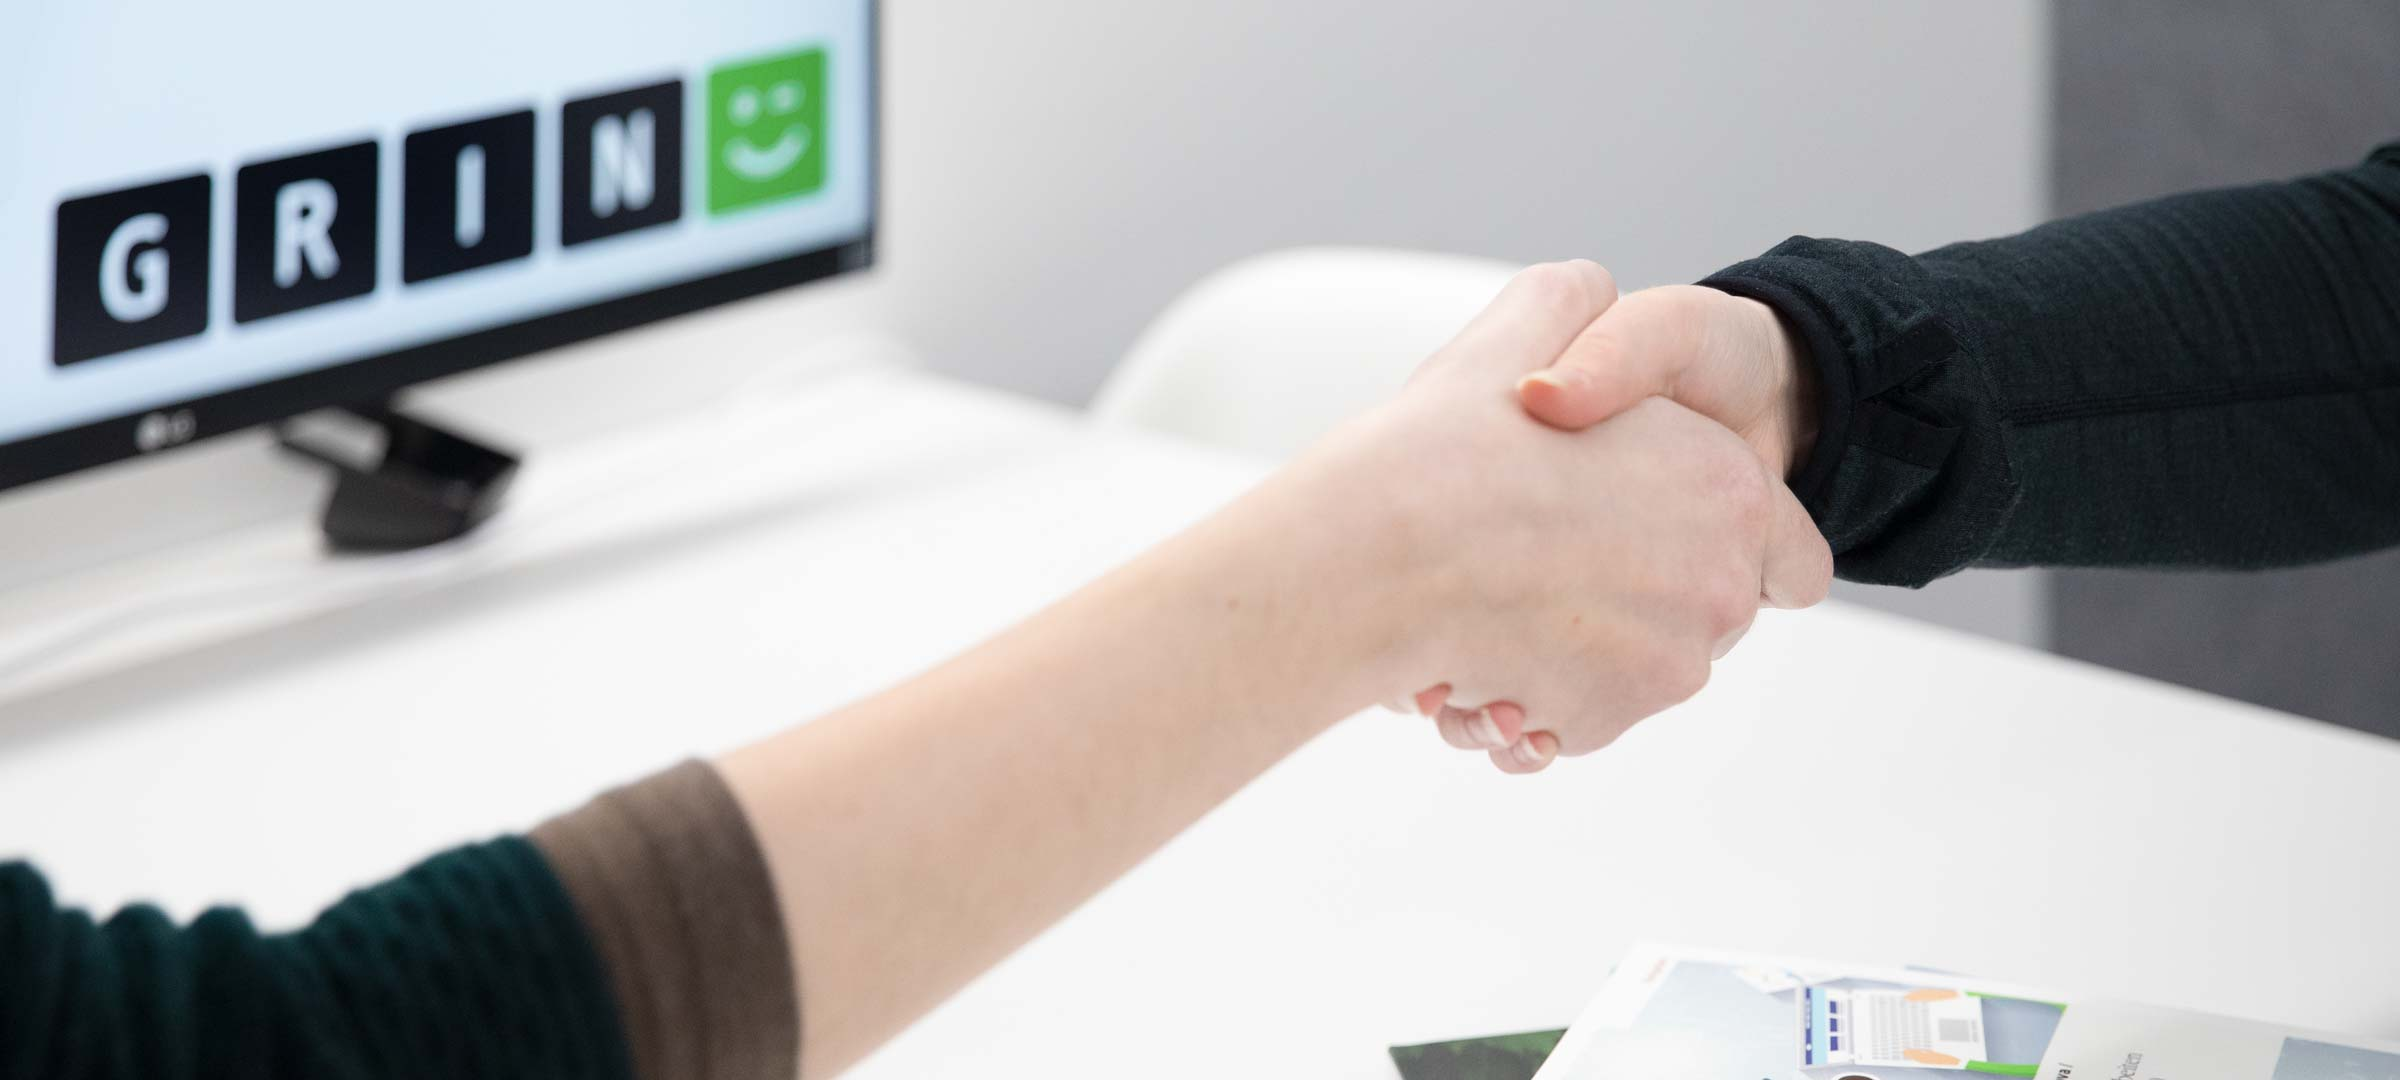 Titelbild: Handschlag im Büro